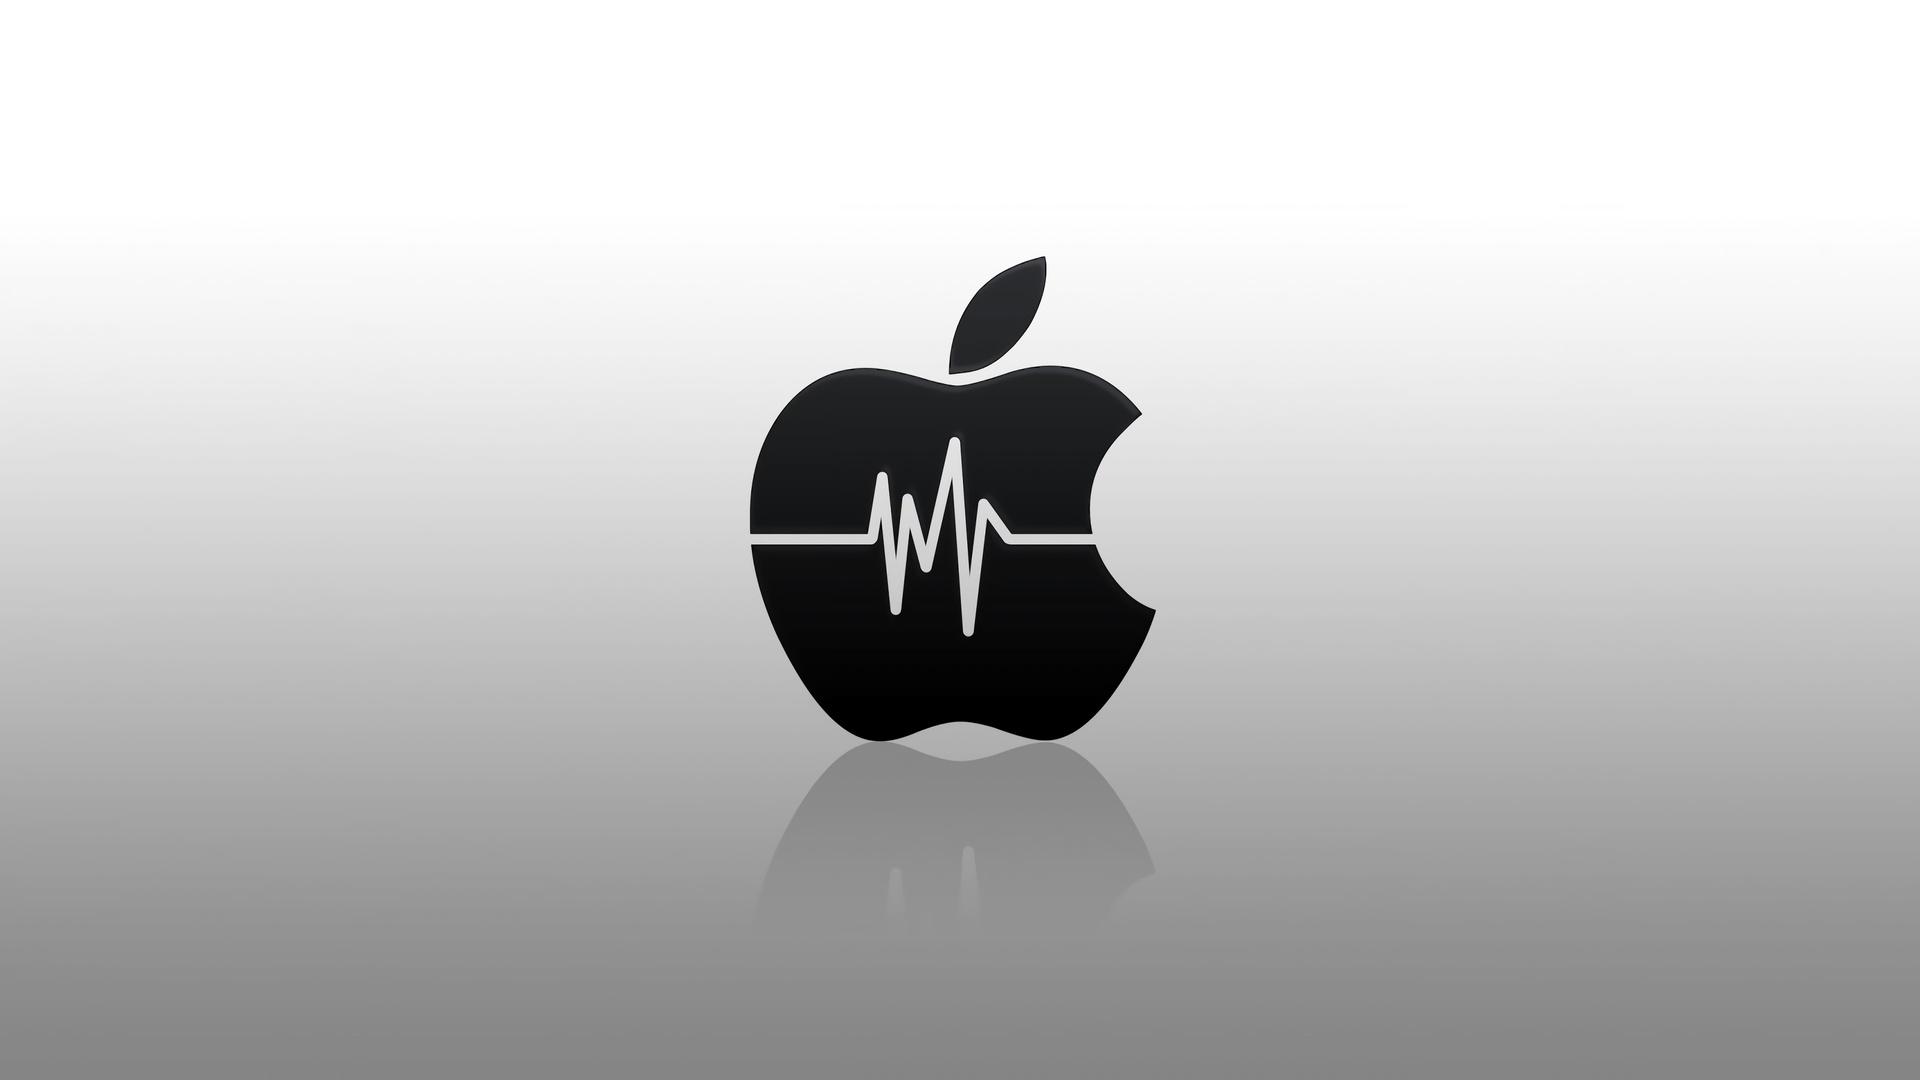 Brand 4k Apple Logo Heartbeat Brand And Logo Logo Black Apple Wallpaper 4k 1920x1080 Download Hd Wallpaper Wallpapertip